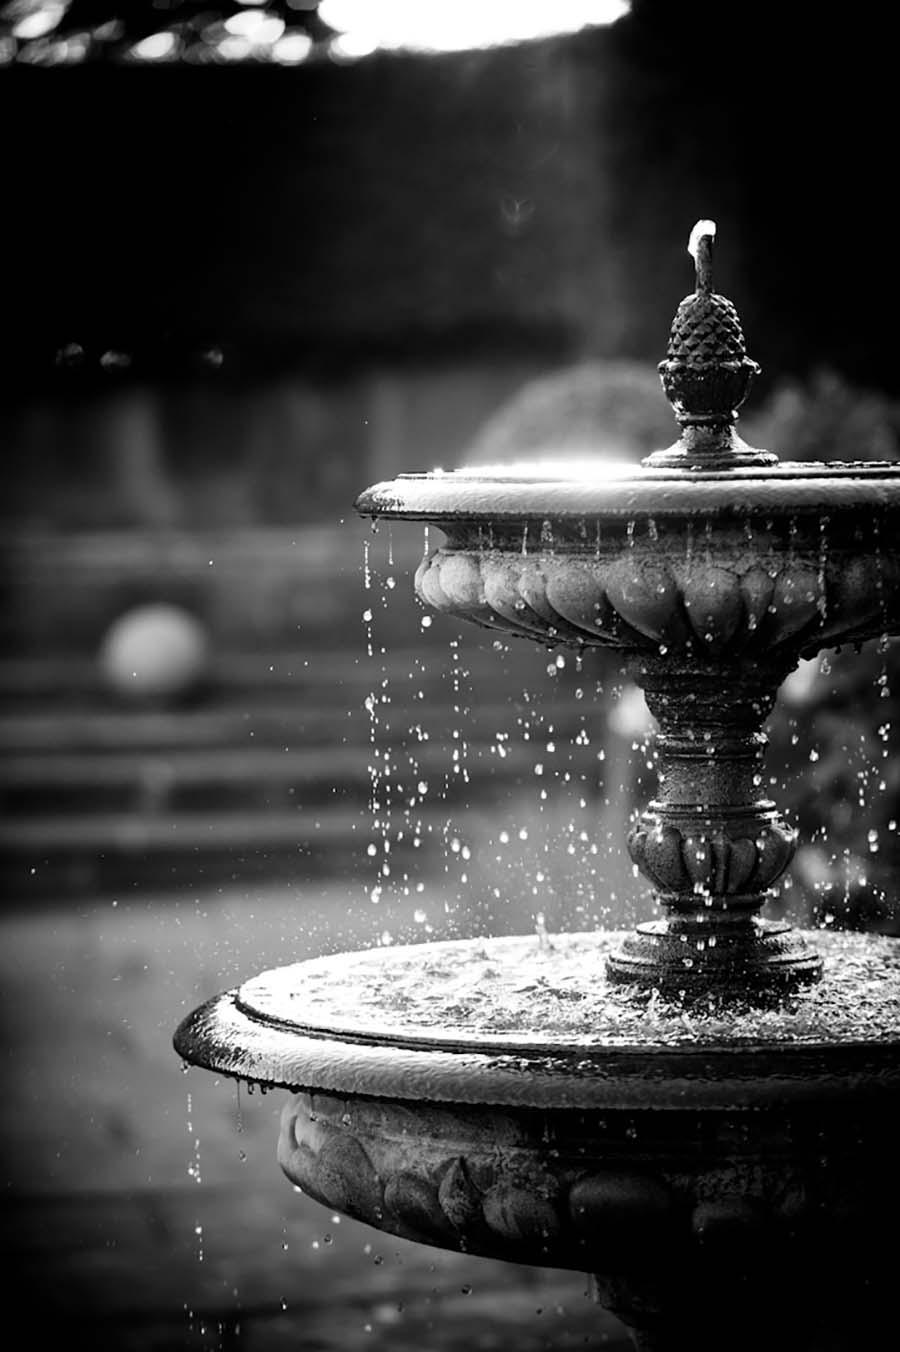 Buckinghams-at-belvoir-castle-wedding-fair-rachael-connerton-photography-7